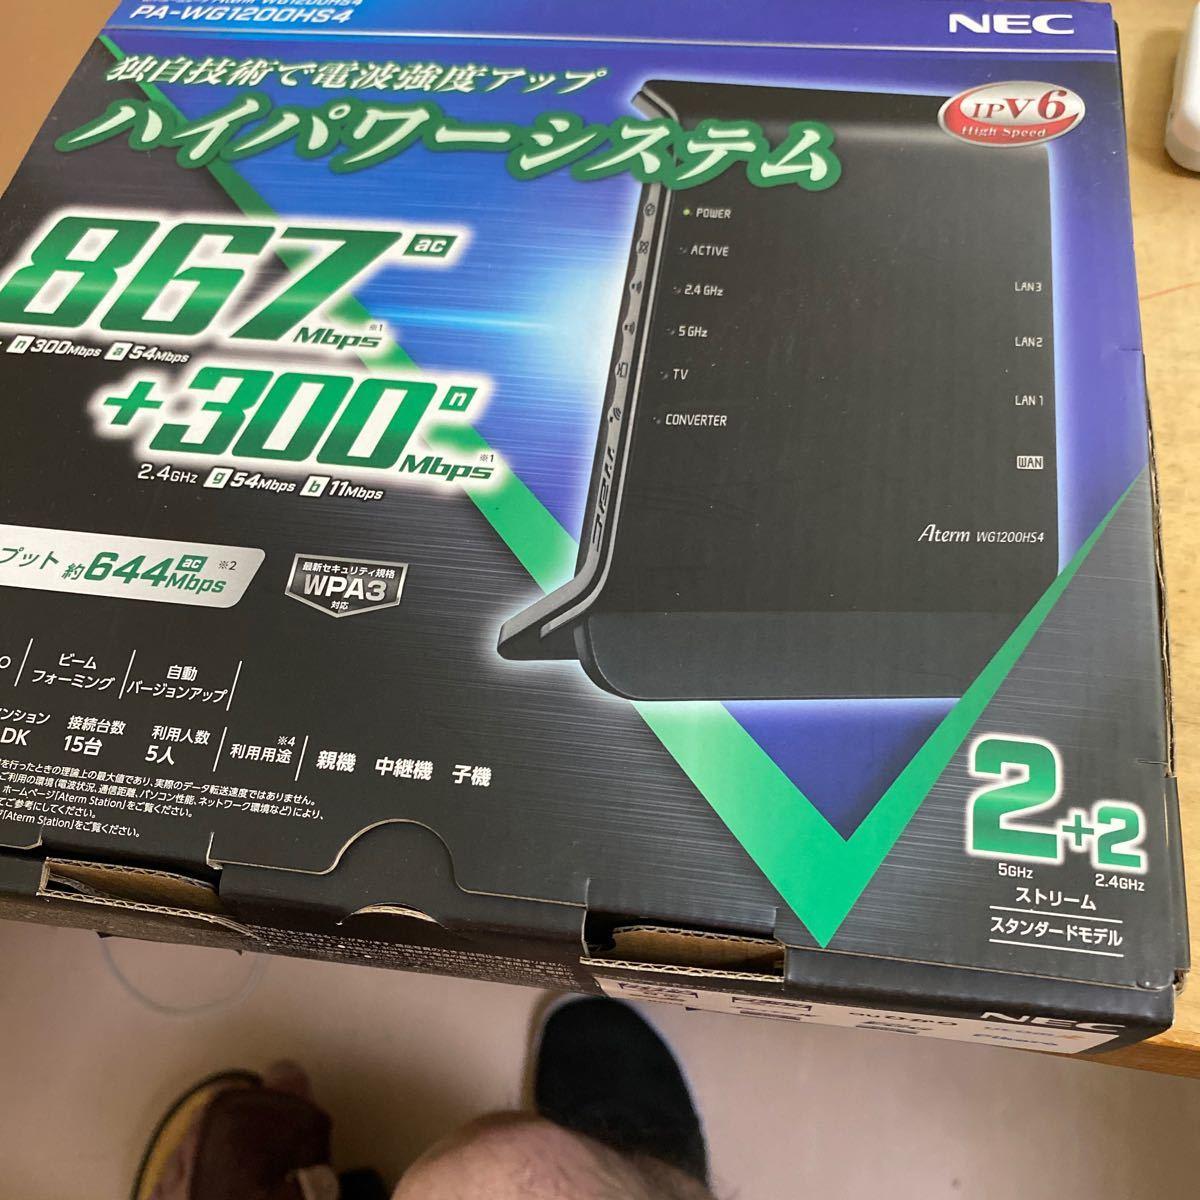 NEC PA-WG1200HP4 無線LAN Wi-Fiルーター[値下】